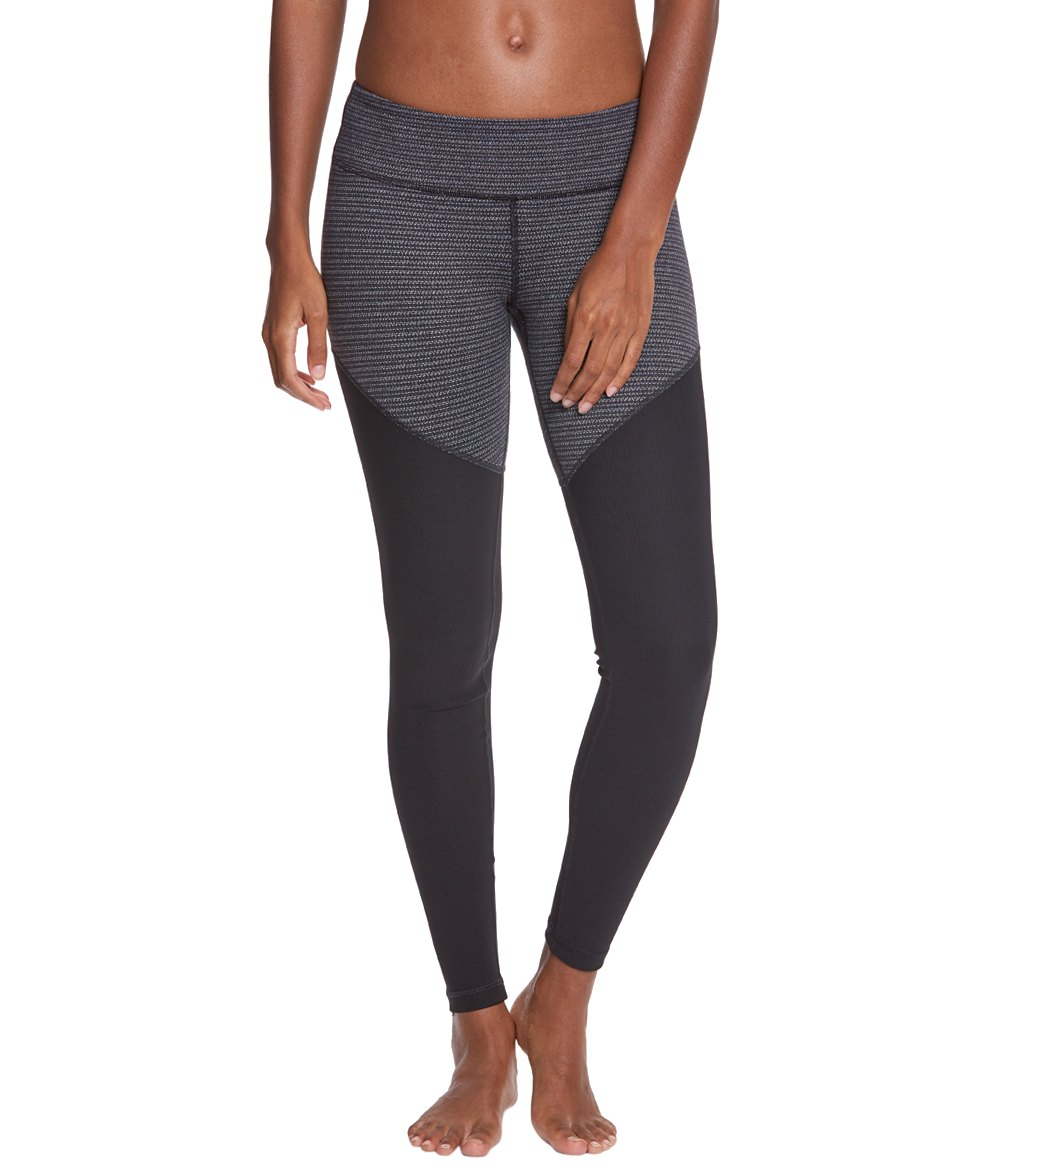 199e871159 Vimmia Tenacity Mid Rise Yoga Leggings at YogaOutlet.com - Free Shipping